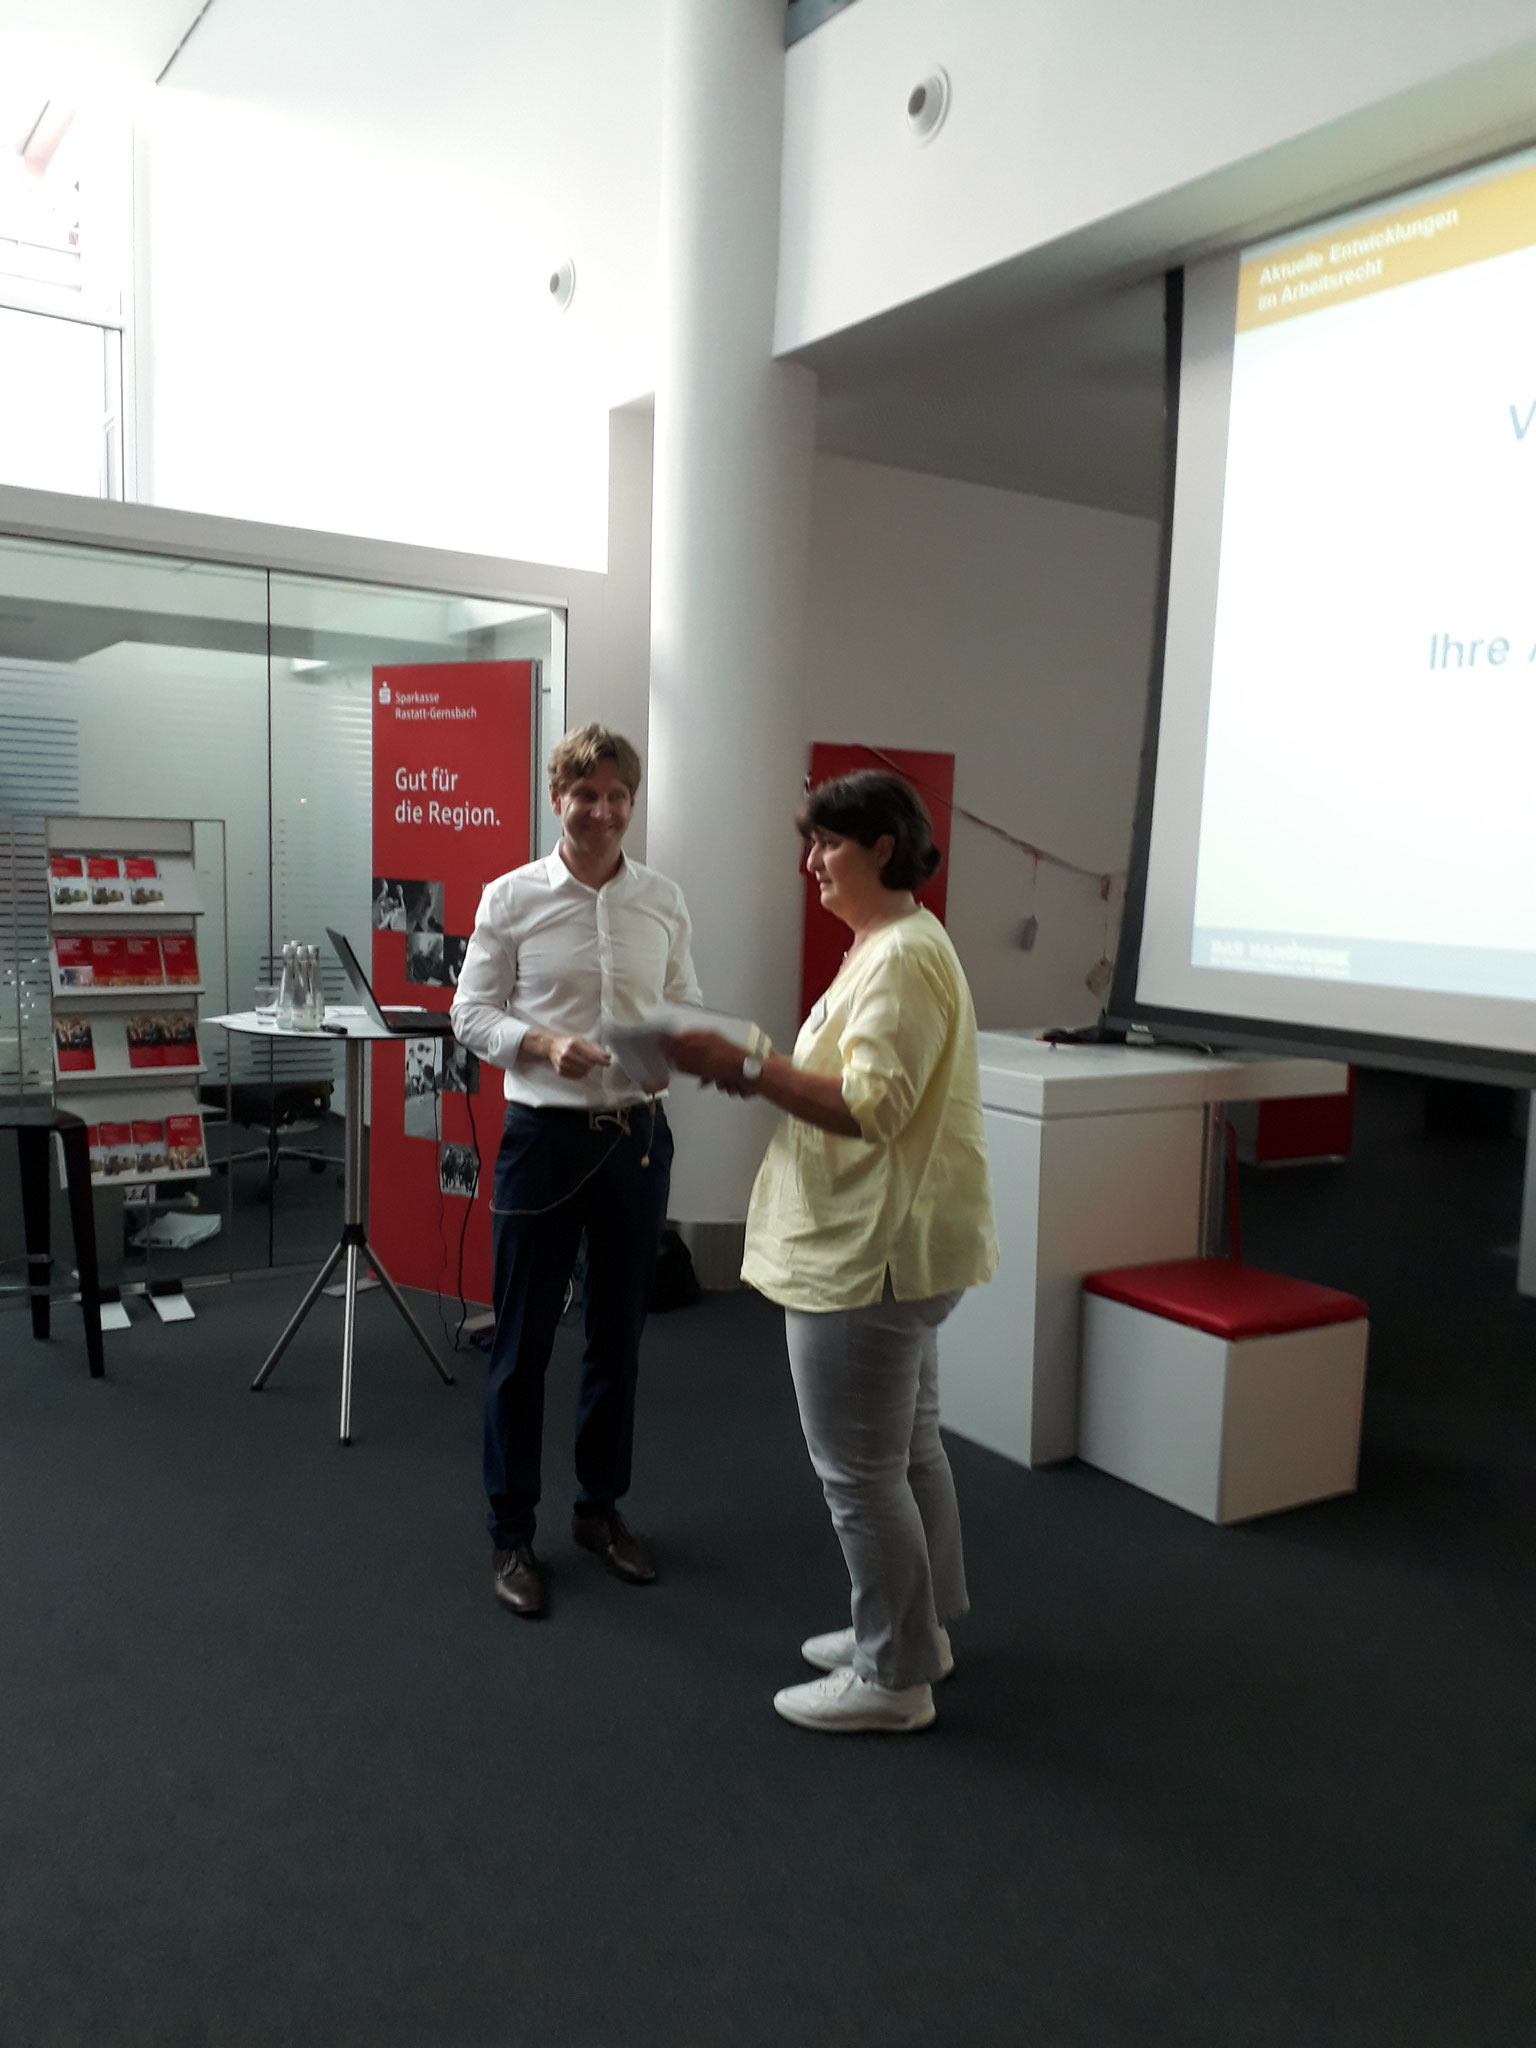 06-2019 Arbeitsrecht - Dankeschön an Herrn Steffen Wenz, HWK Karlsruhe